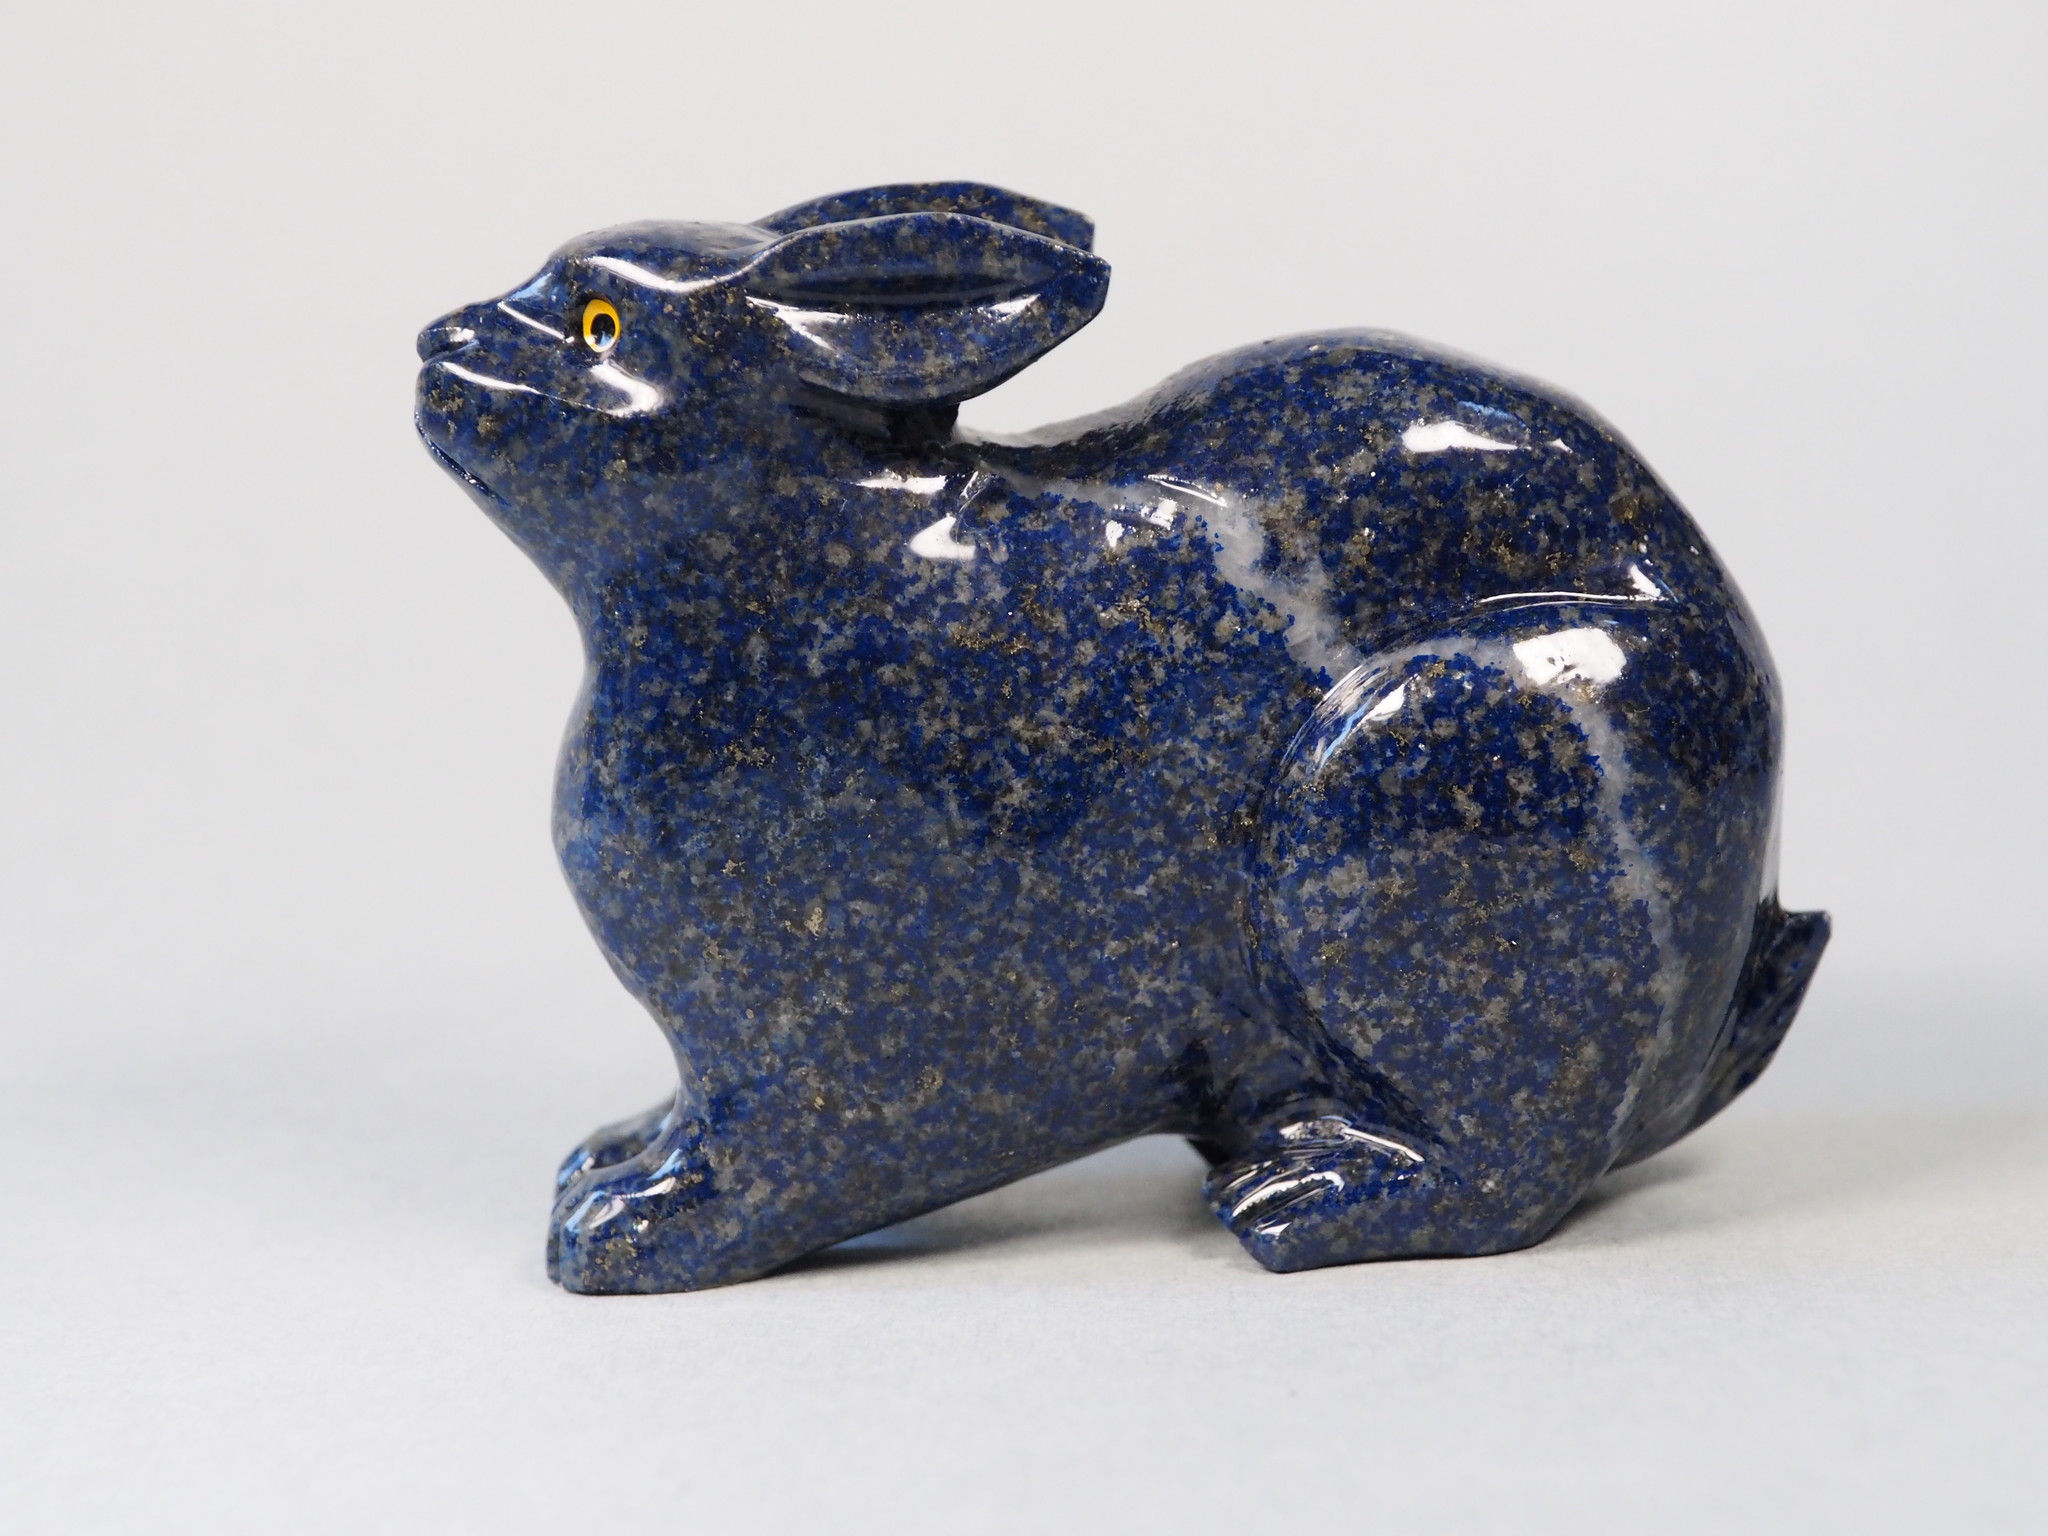 Extravagant Royal blau Lapis lazuli  tier figur briefbeschwere Hase Nr:21/13